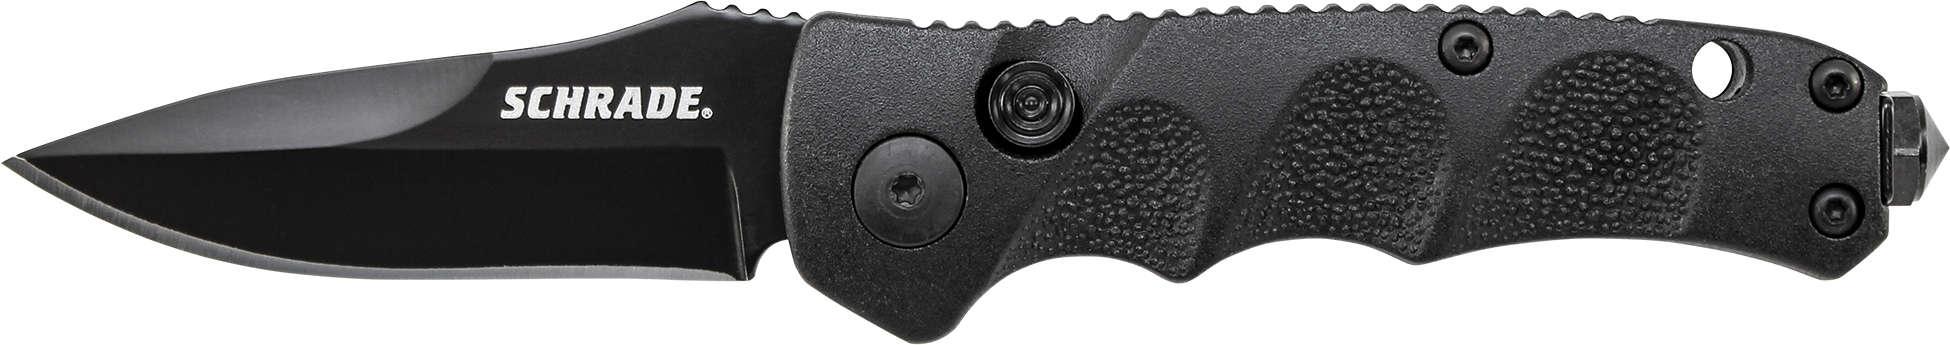 SC60MB - Schrade® Mini Push Button Lock Folding Knife Drop Point Blade